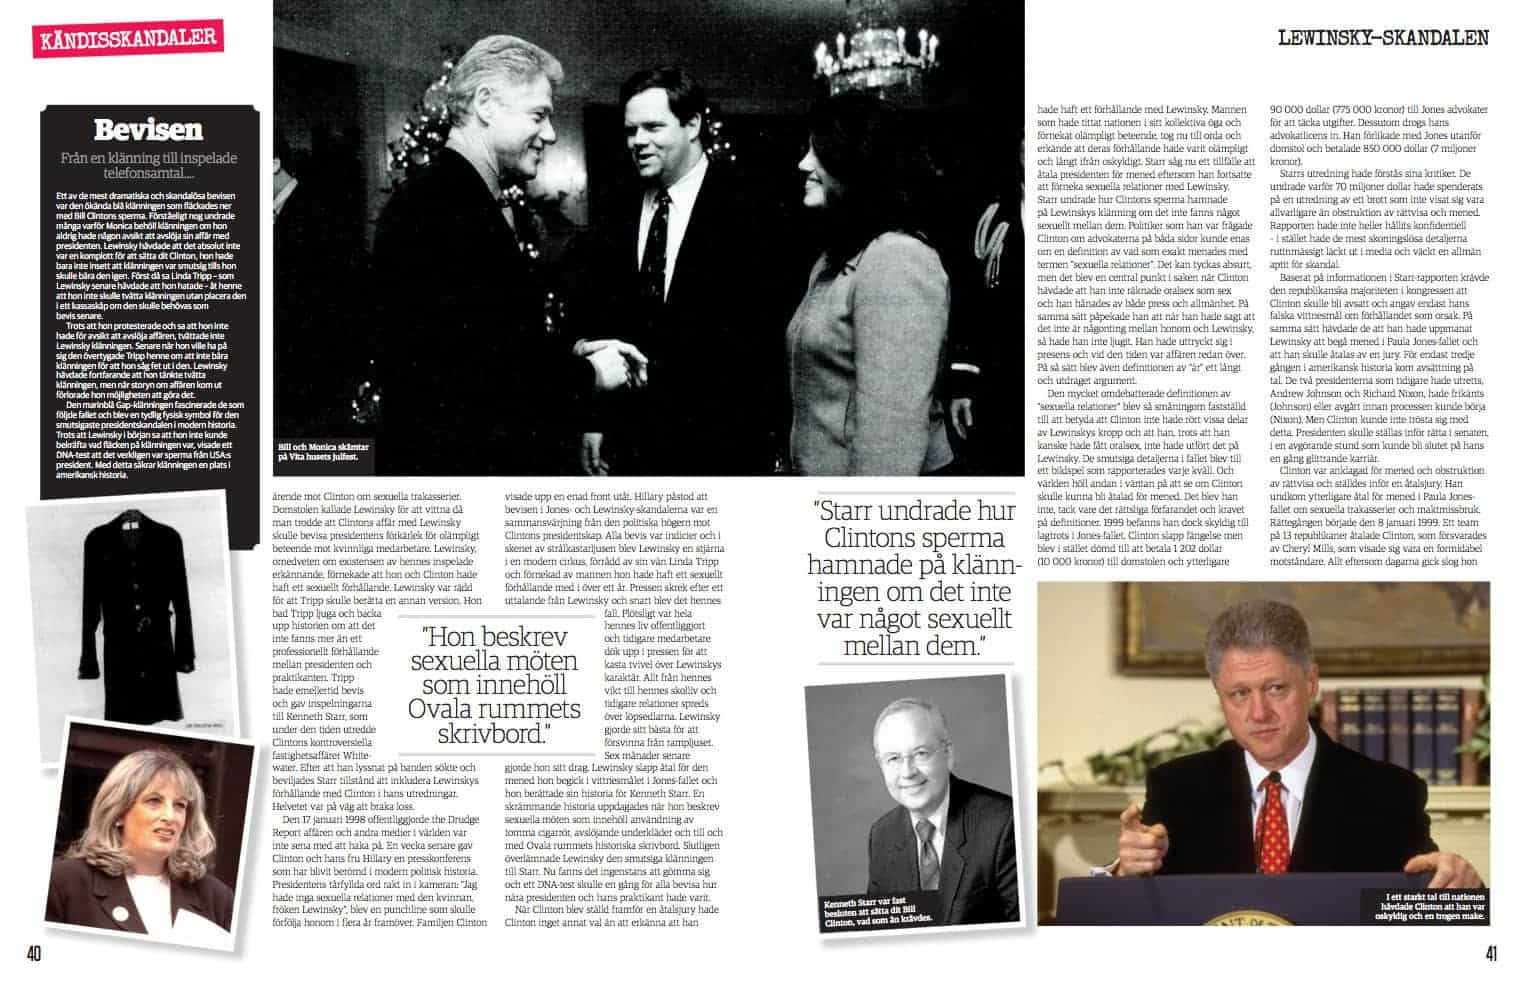 Lewinsky-skandalen, uppslag